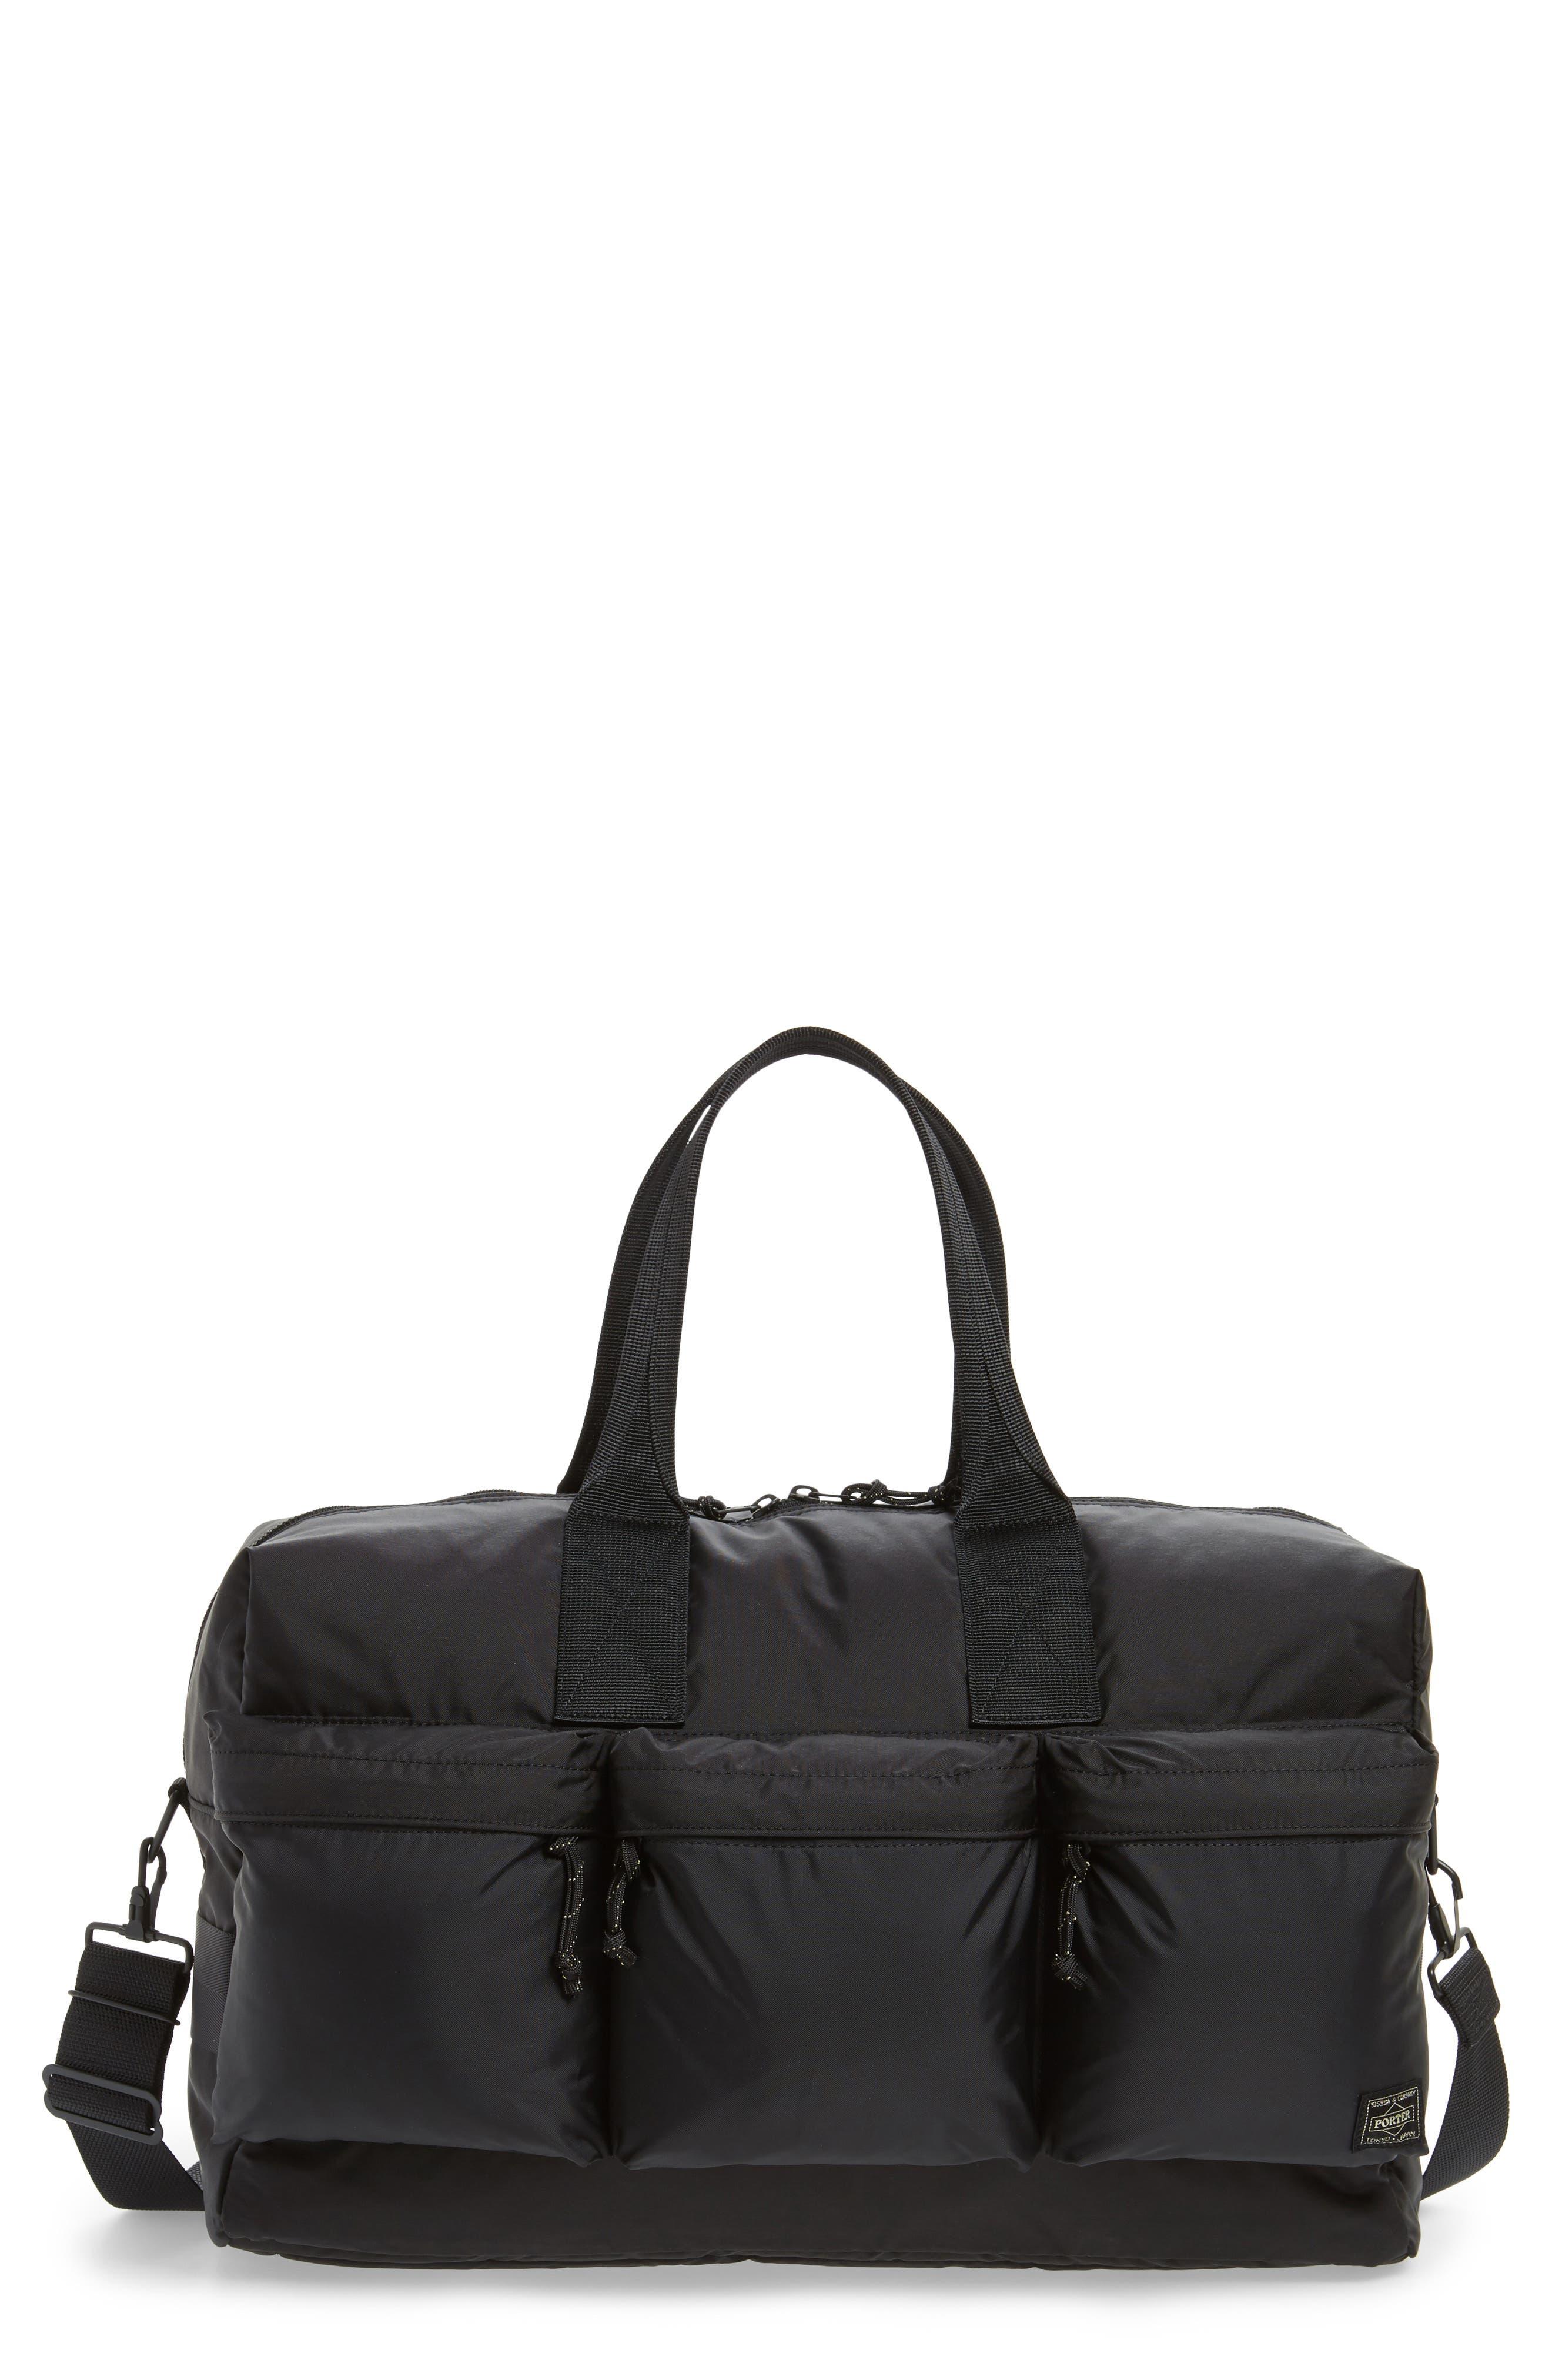 Porter-Yoshida & Co. Force Duffel Bag,                         Main,                         color, Black